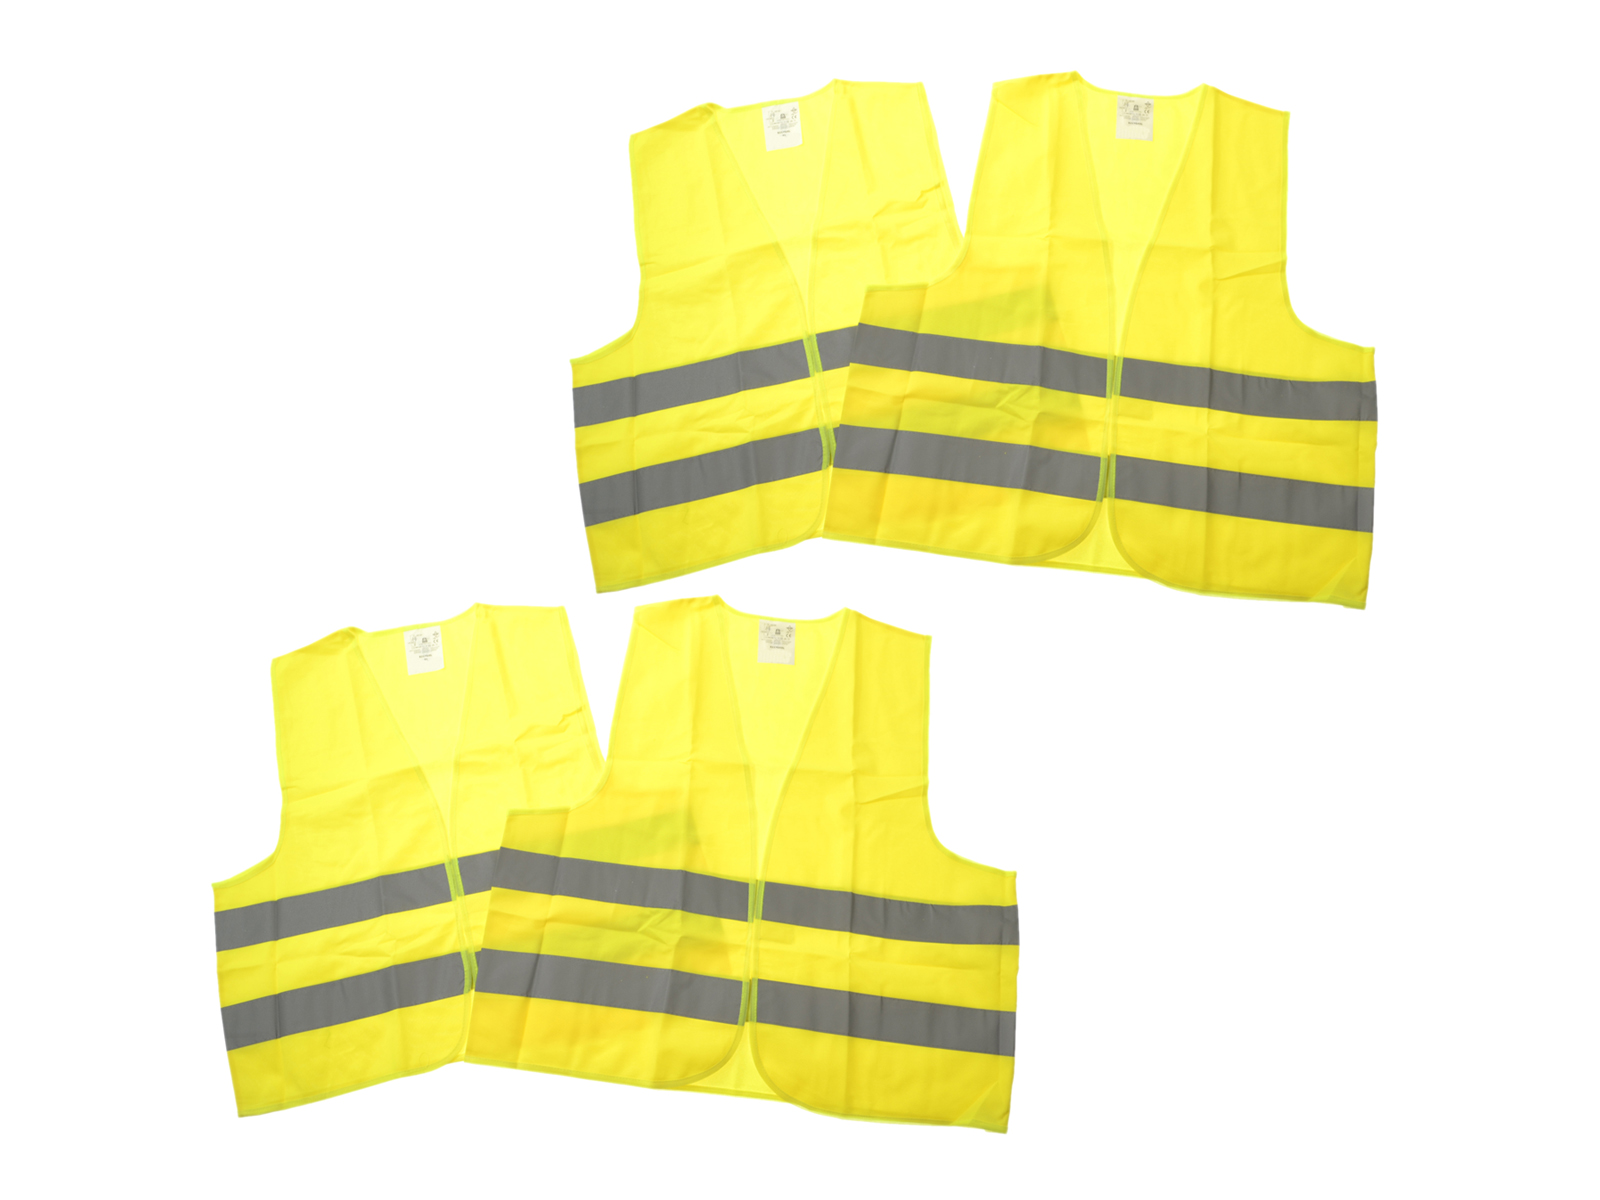 4x Warnwesten KFZ gelb DIN EN ISO 20471 in XL für TÜV-HU